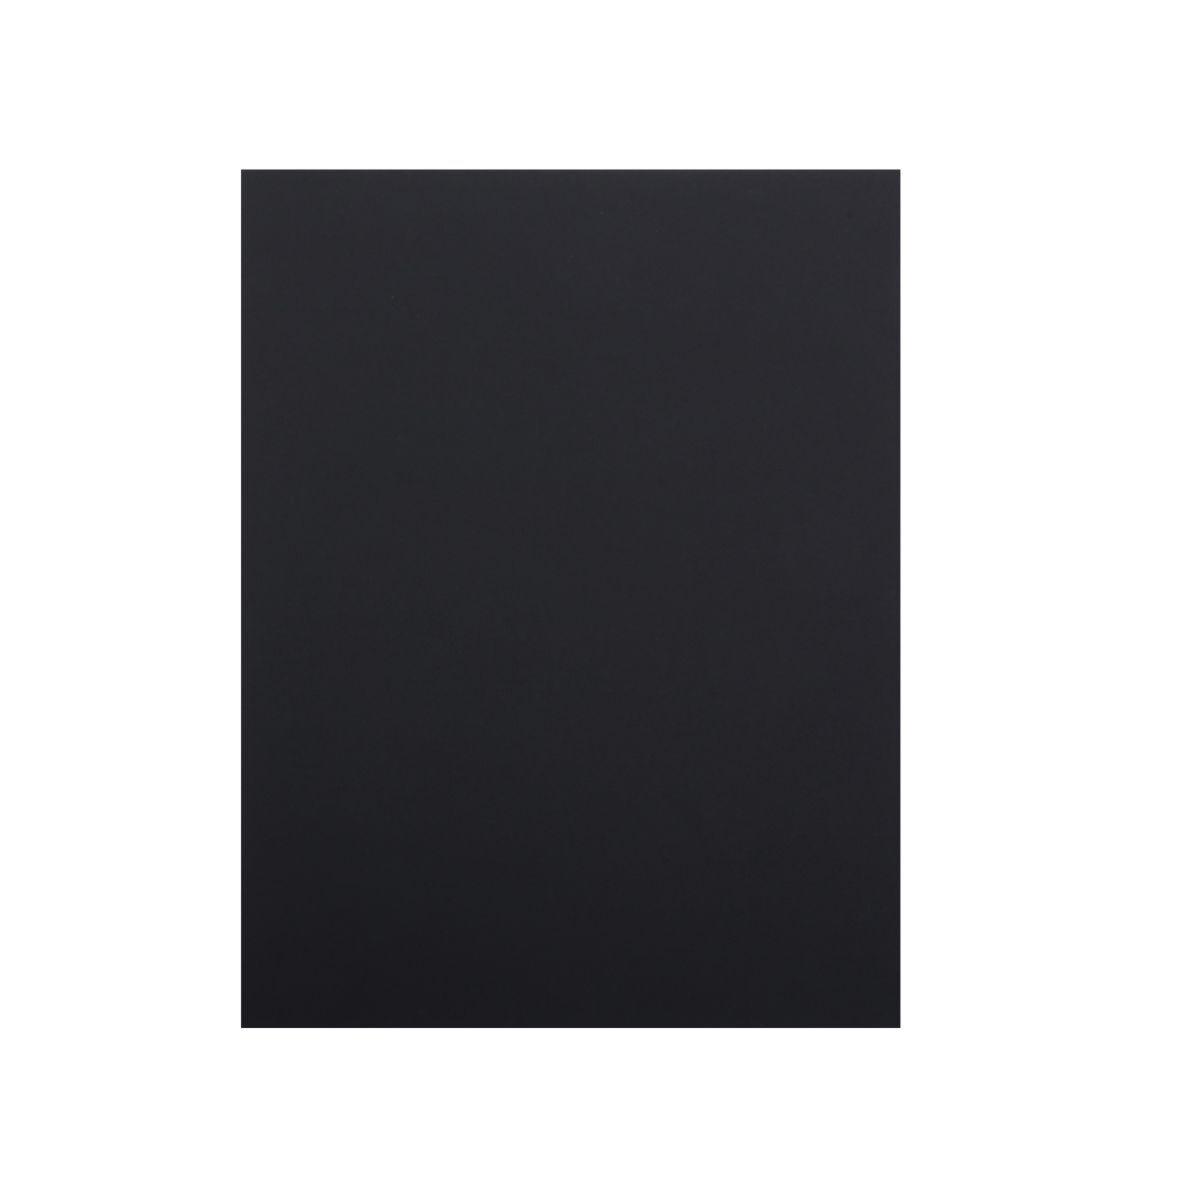 Ryman Coloured Card 280 Micron 450x640mm